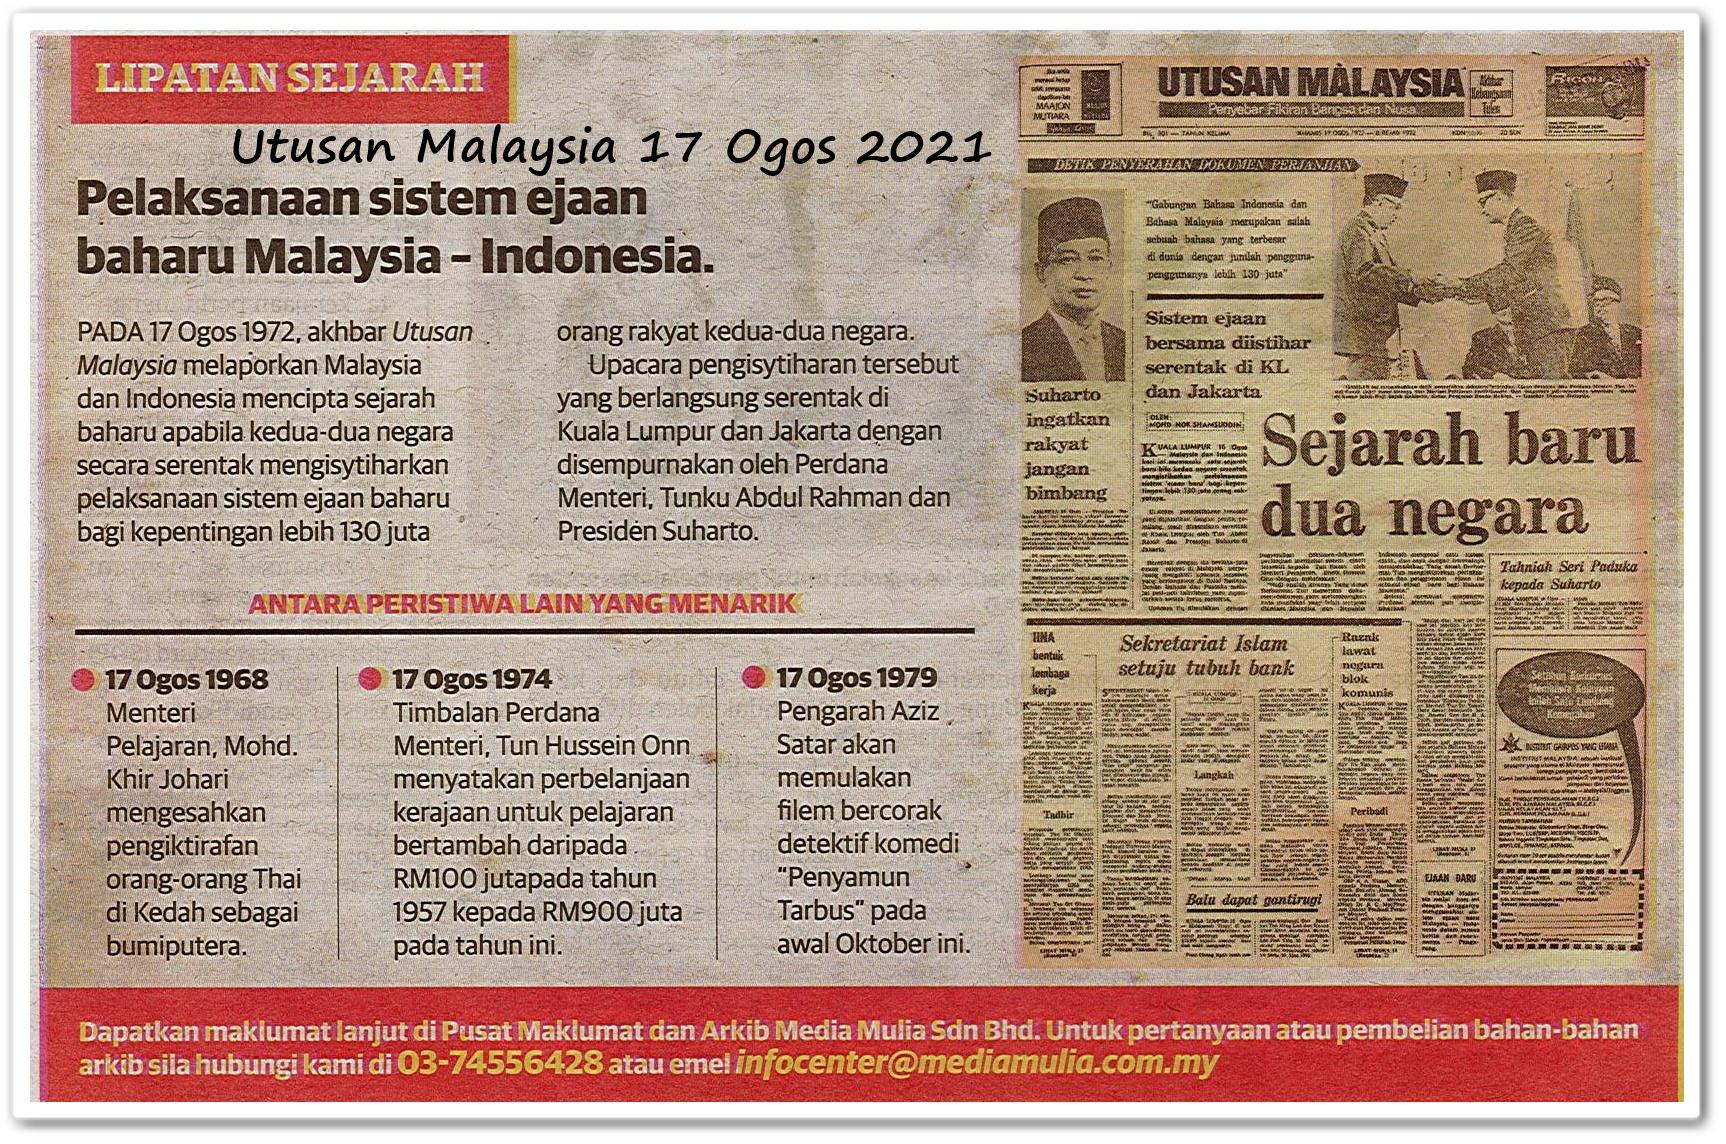 Lipatan sejarah 17 Ogos - Keratan akhbar Utusan Malaysia 17 Ogos 2021